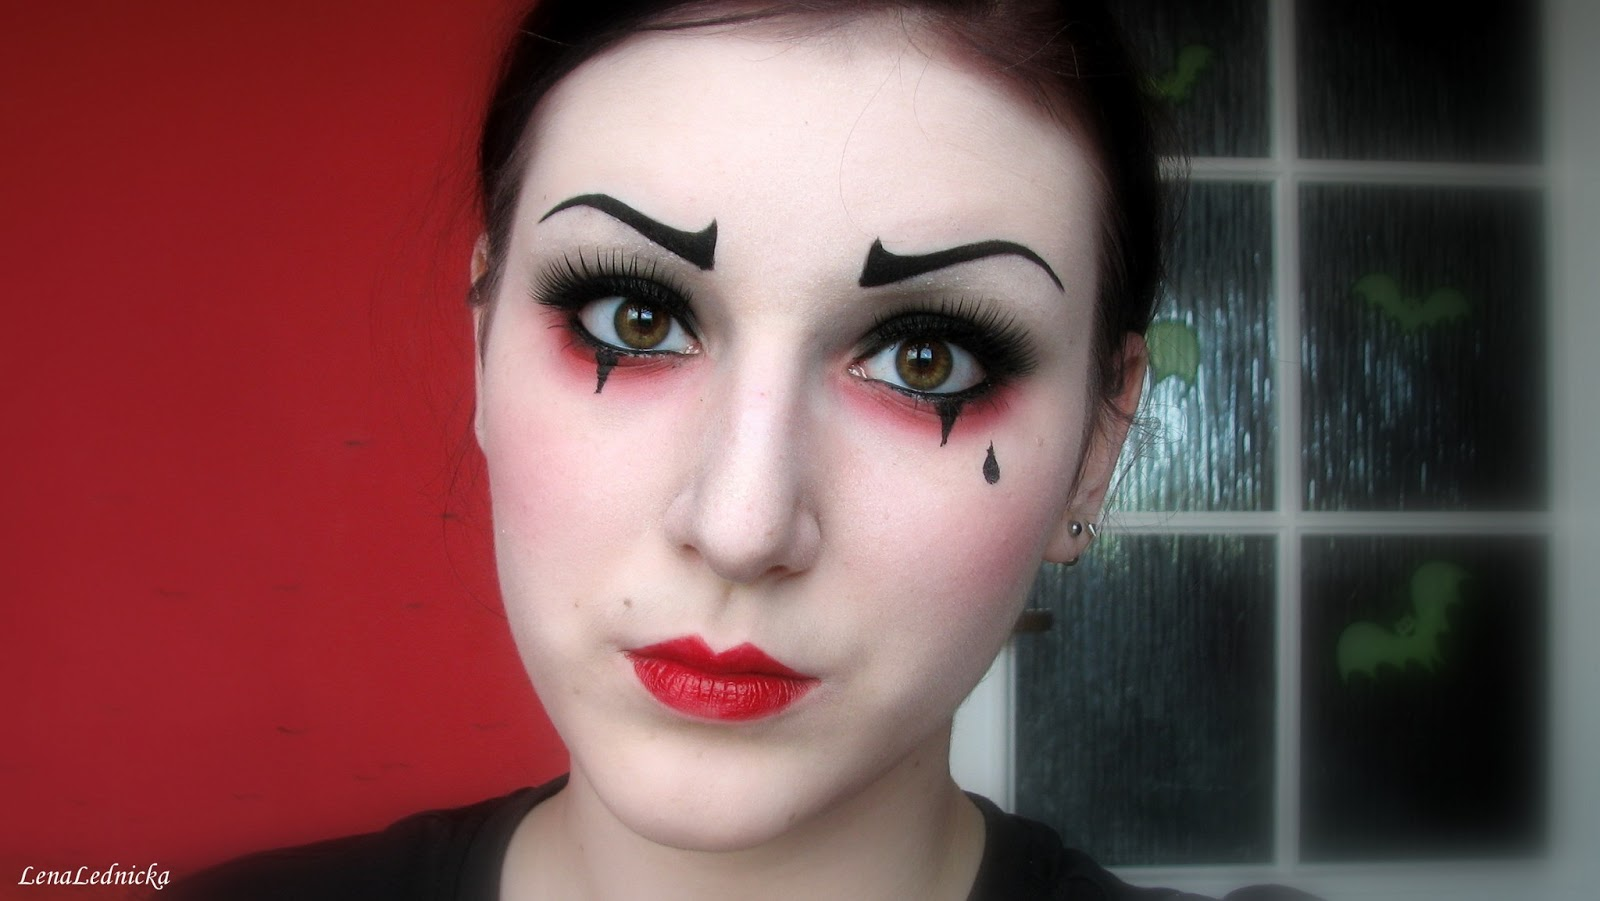 lena lednicka pierrot the clown makeup tutorial. Black Bedroom Furniture Sets. Home Design Ideas